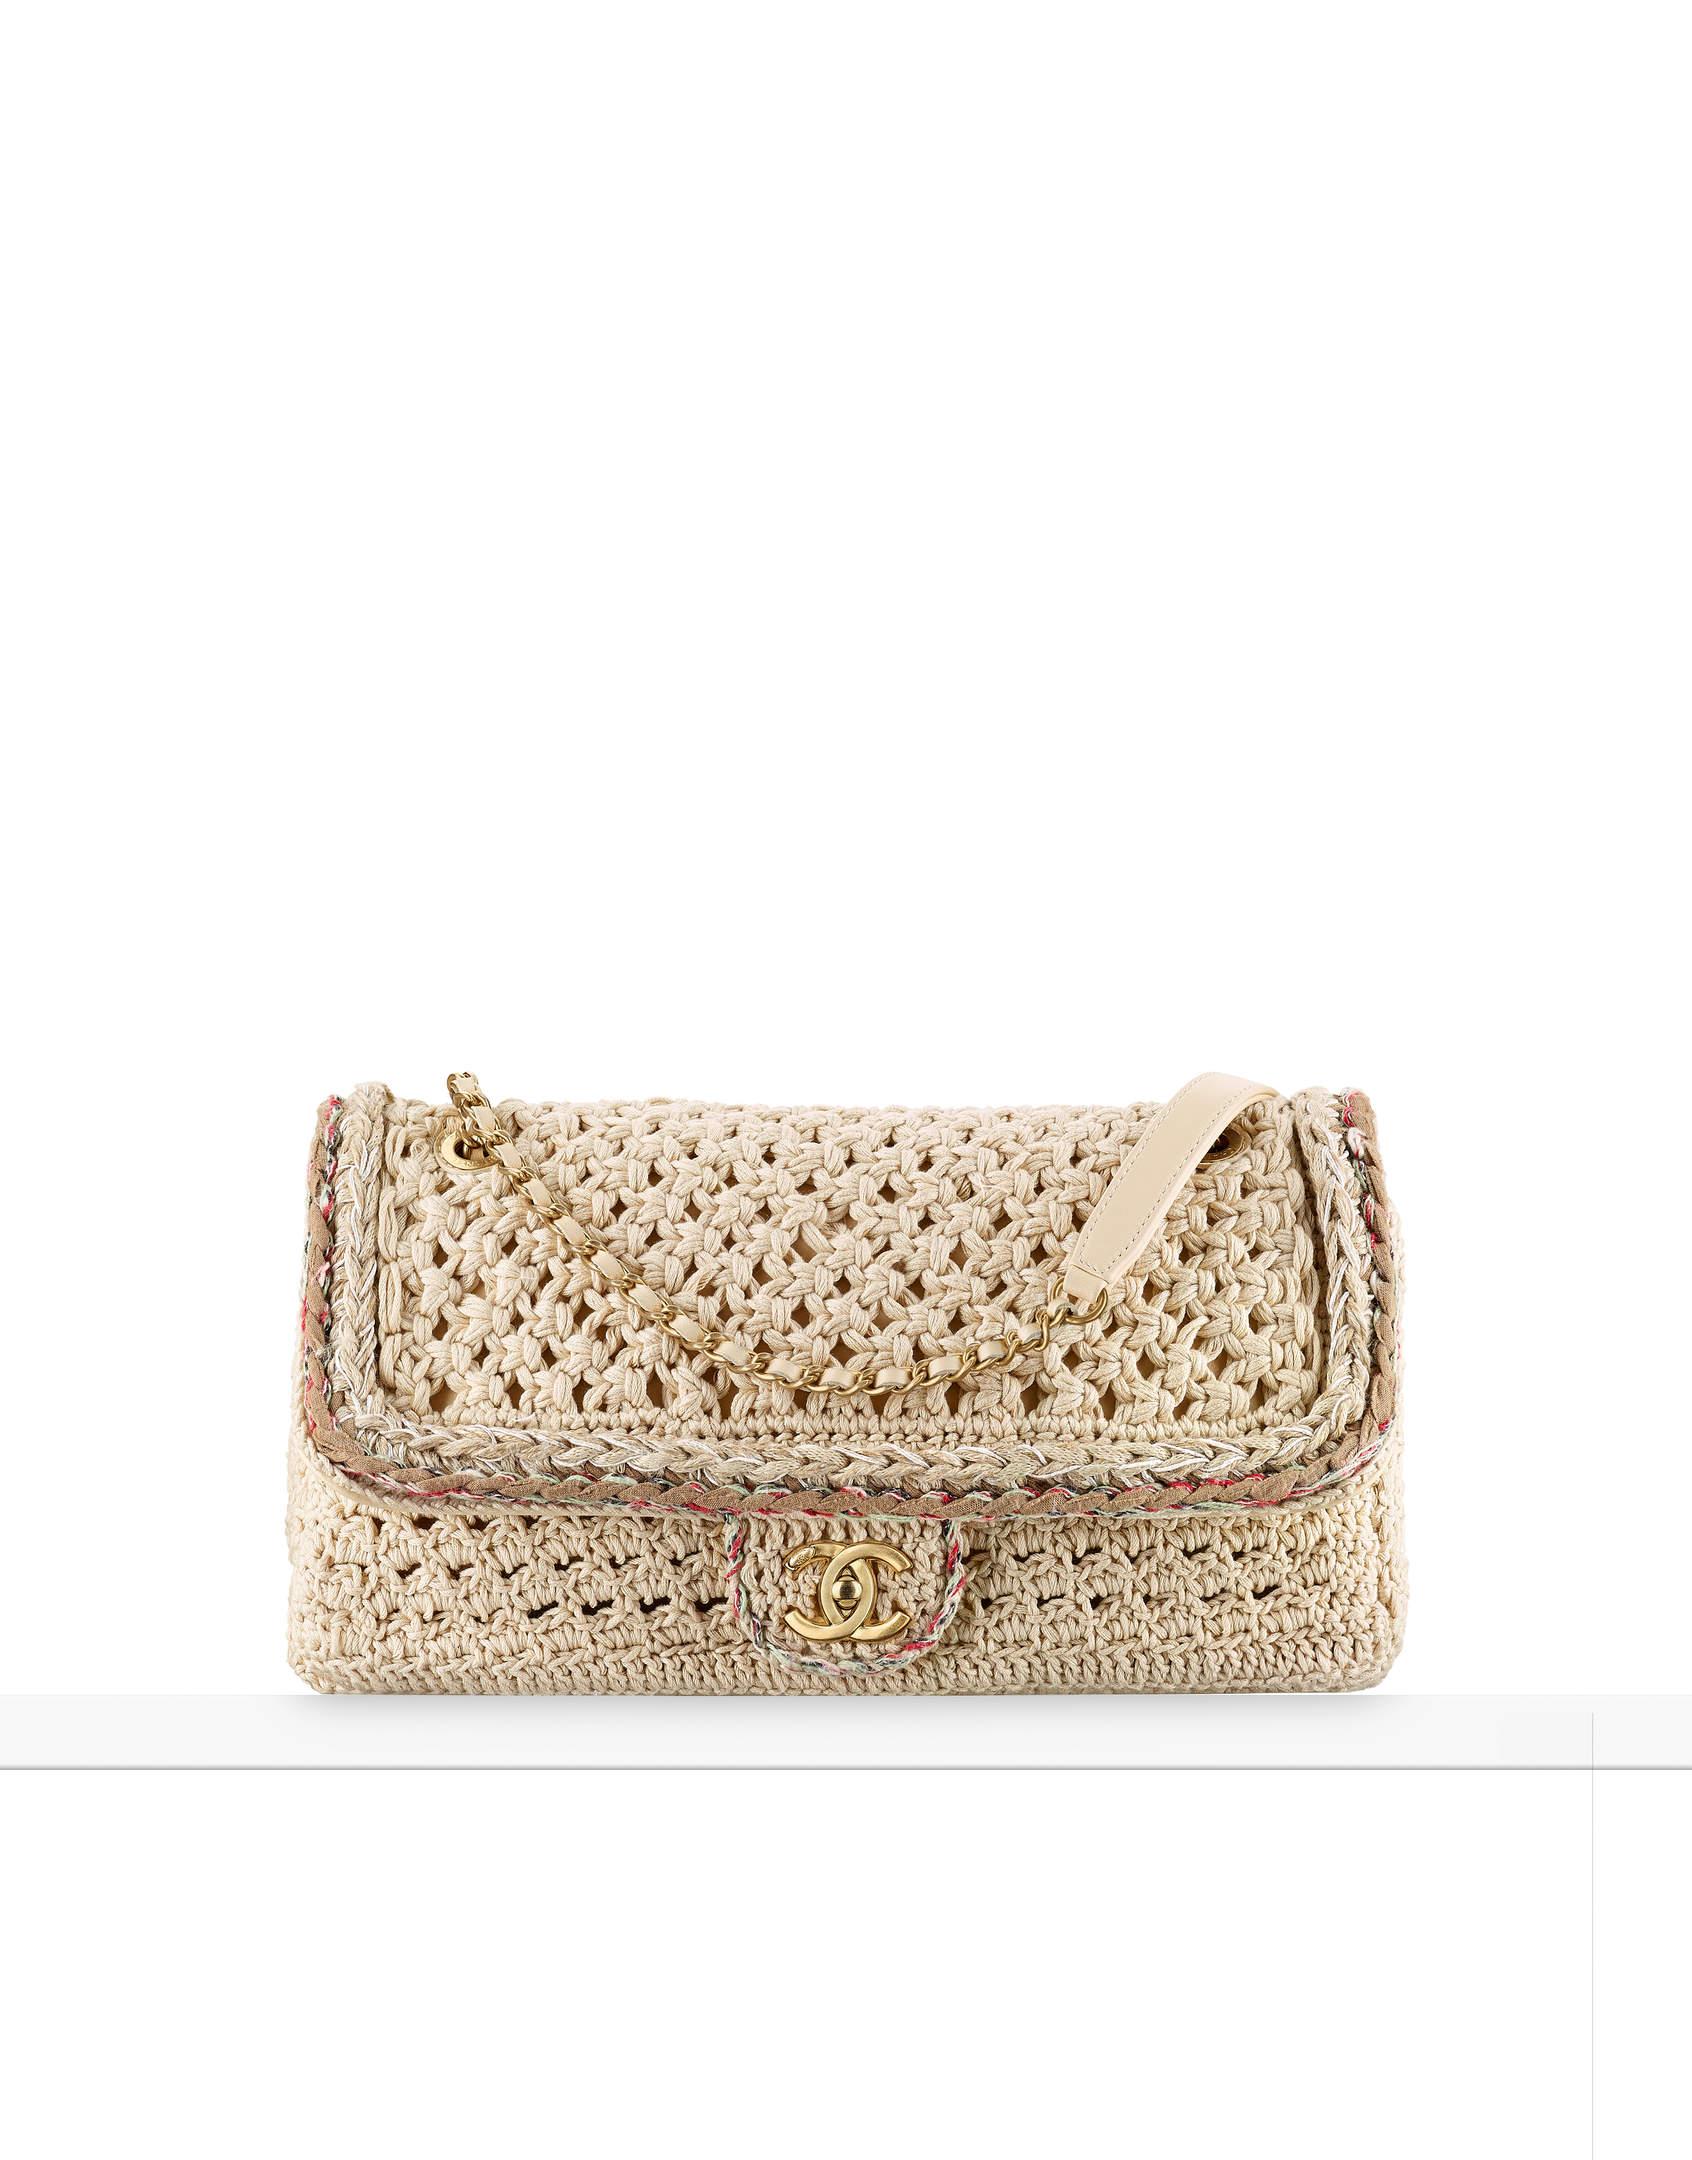 flap_bag-zoom.jpg.fashionImg.medium (4).jpg